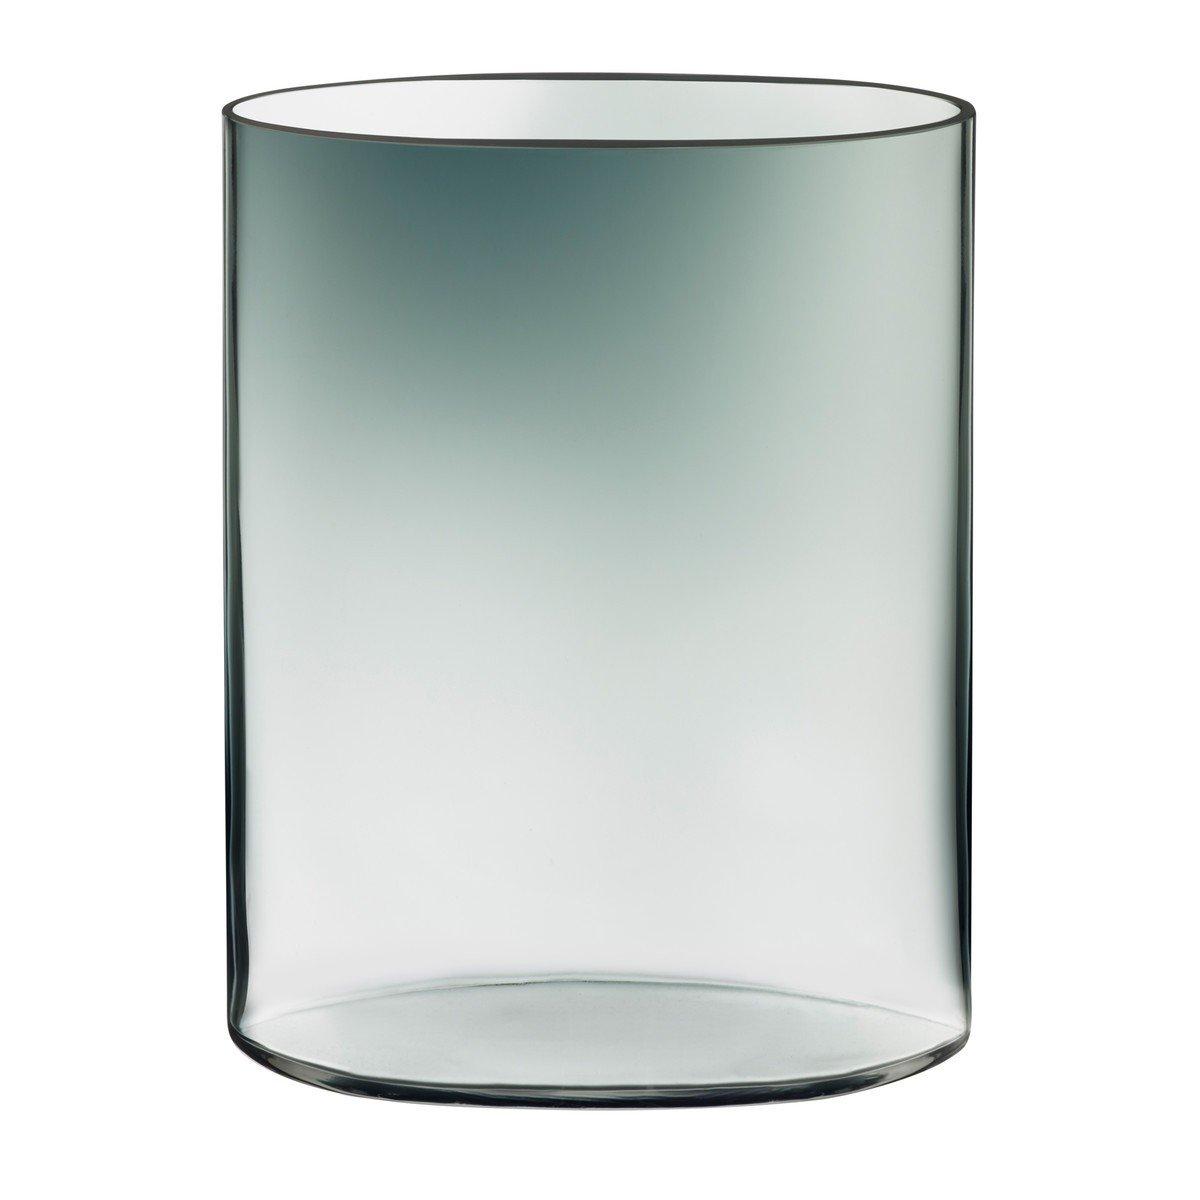 Iittala 1015377 Ovalis Vase 25 cm, grau grau grau klar 06c68f